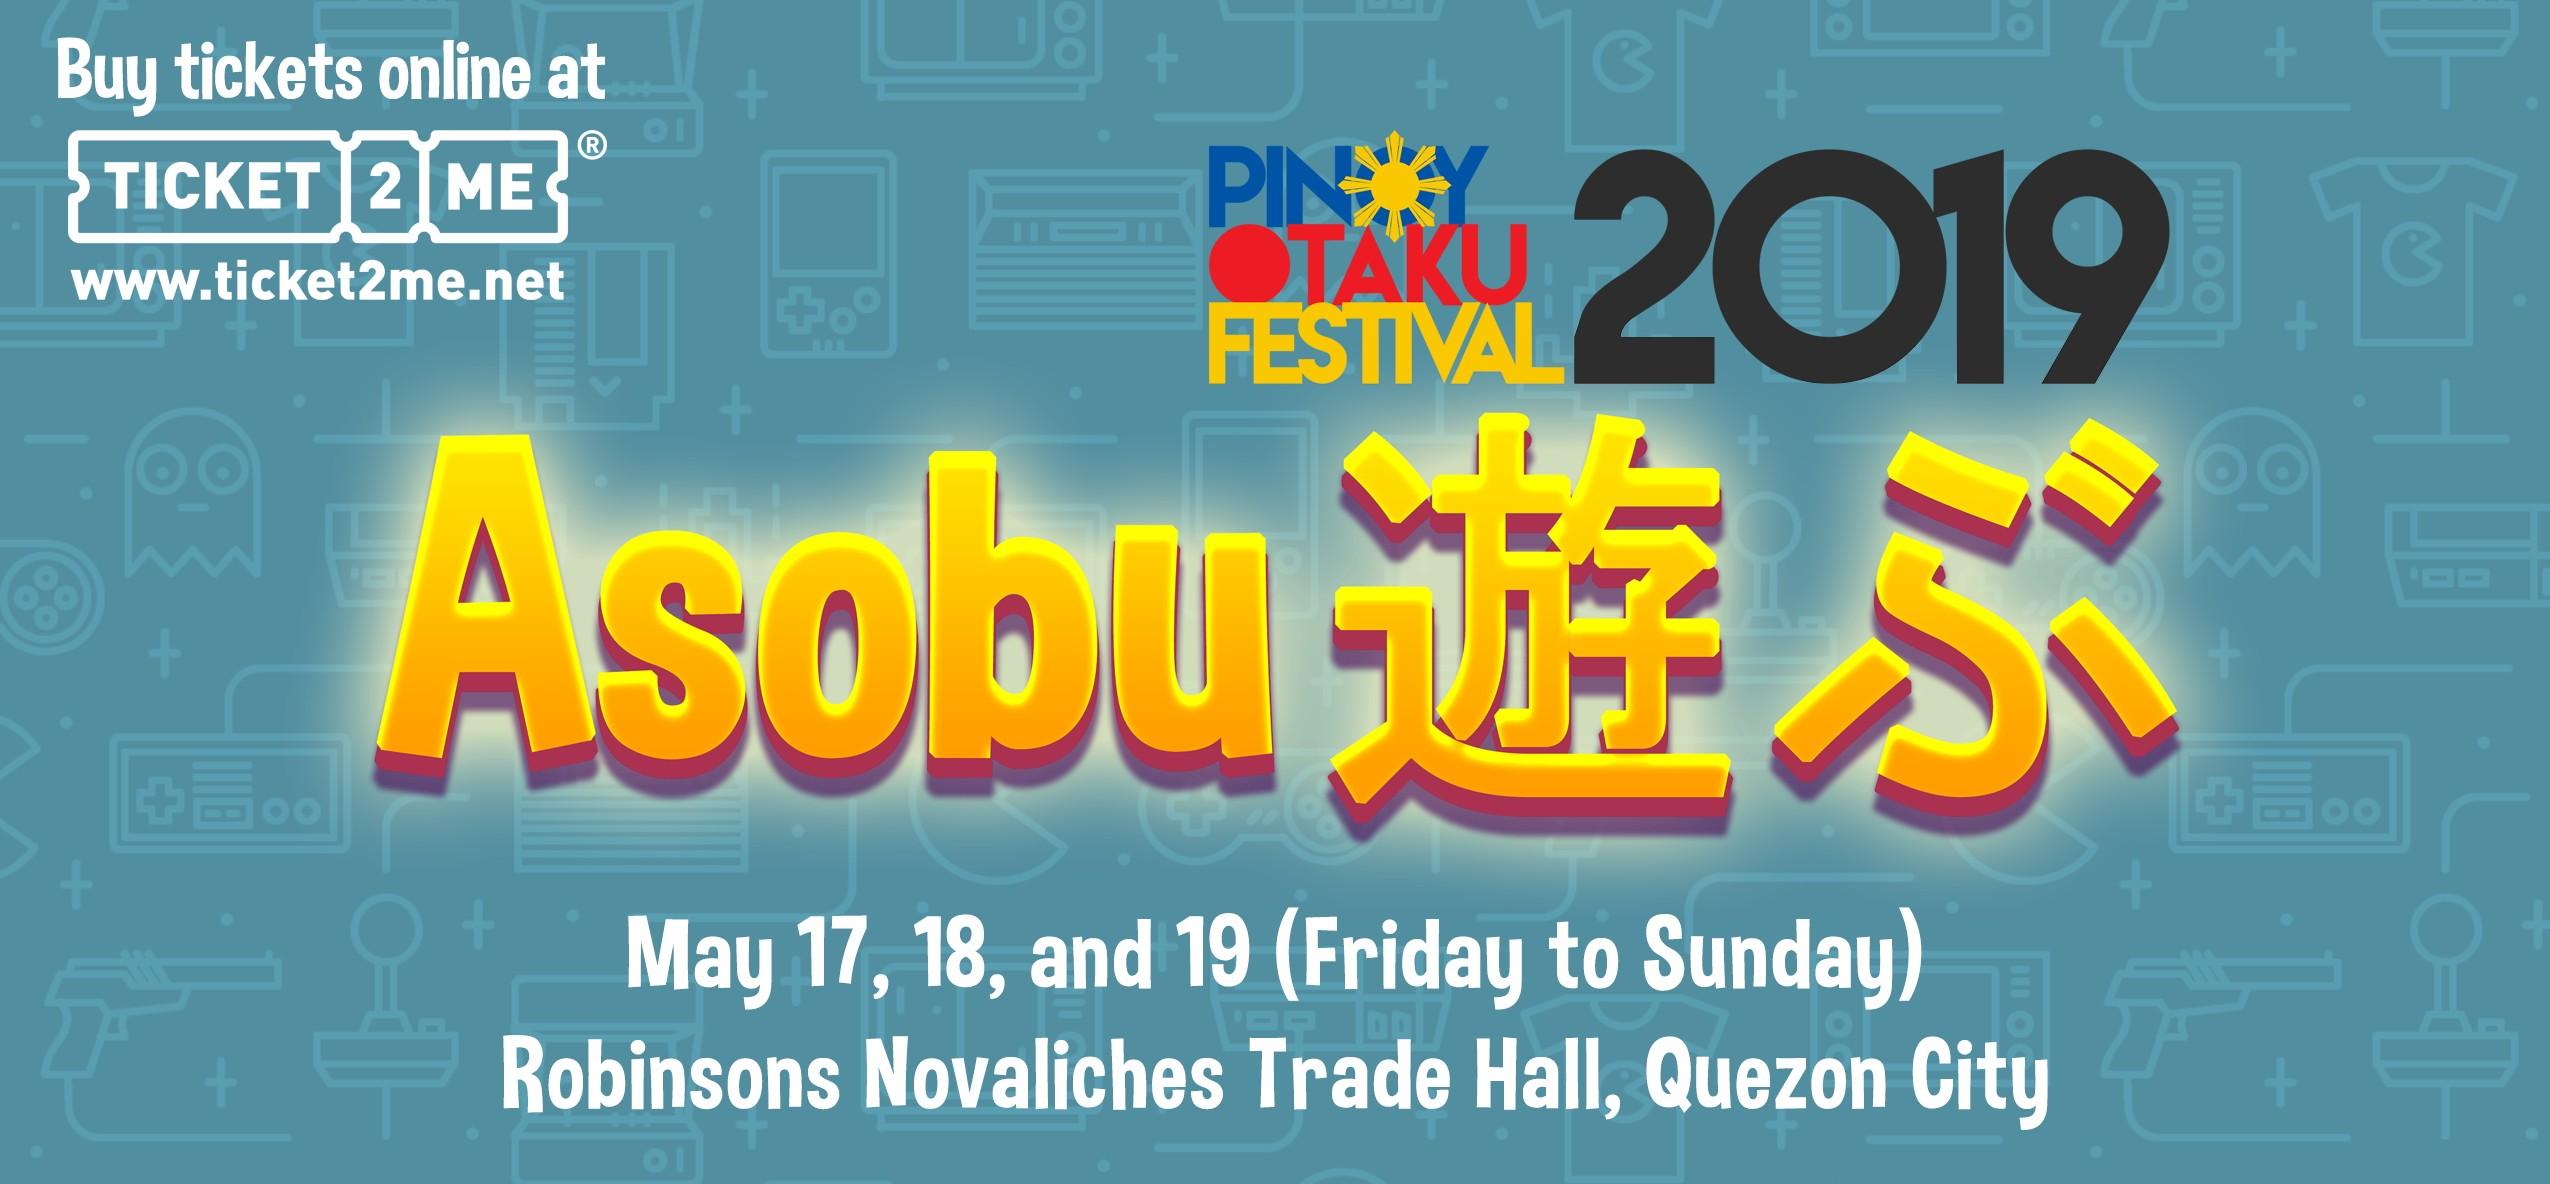 Pinoy Otaku Festival 2019: Asobu set on May 17 to 19